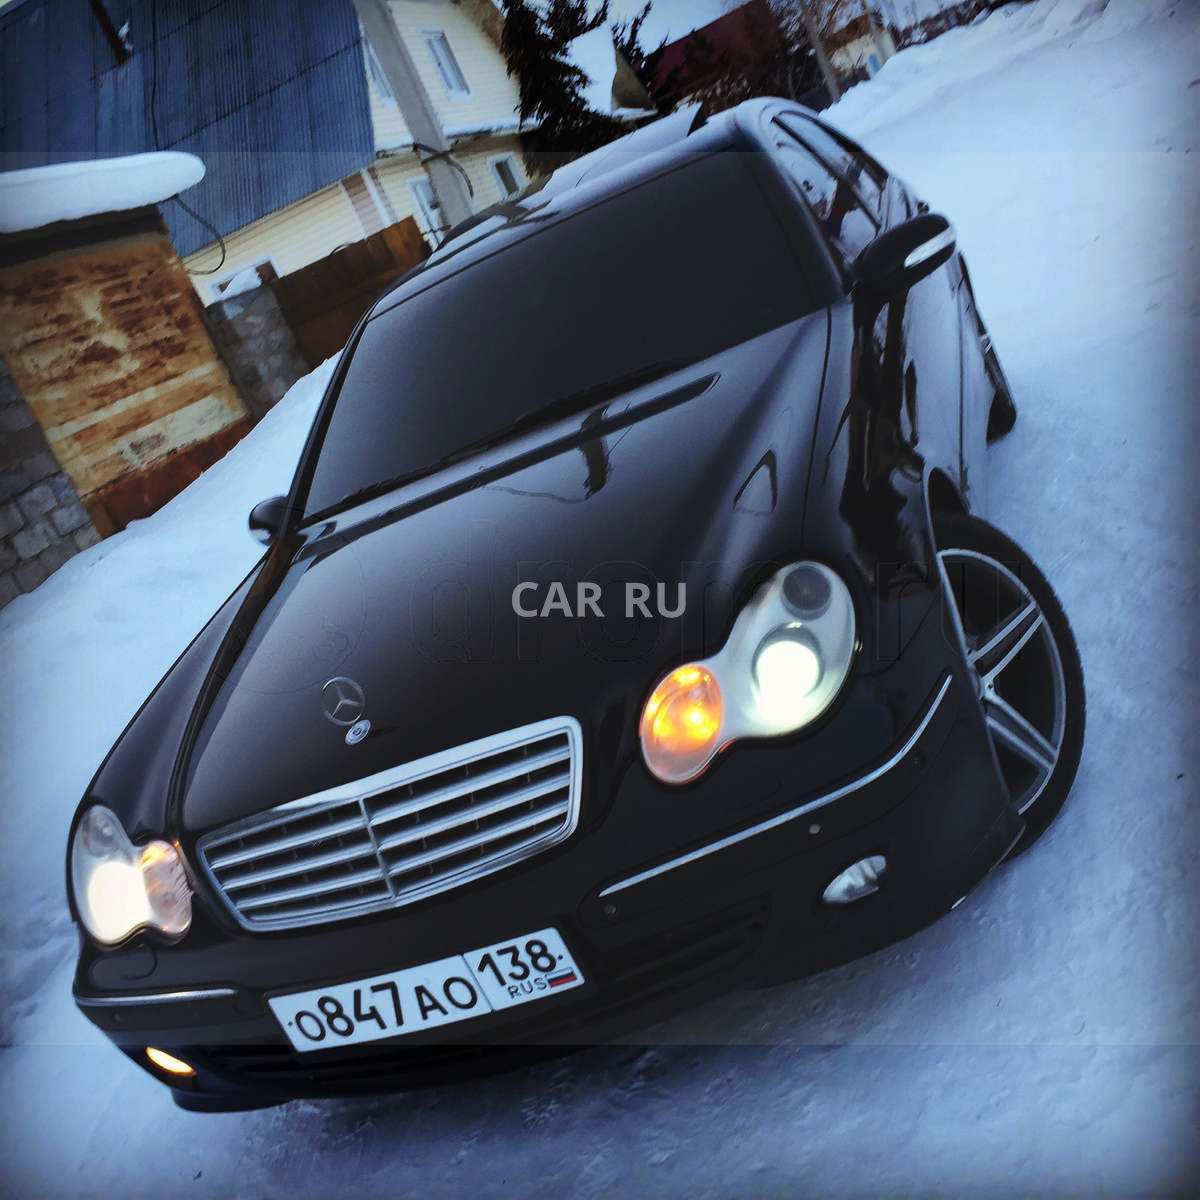 Mercedes C-Class, Ангарск